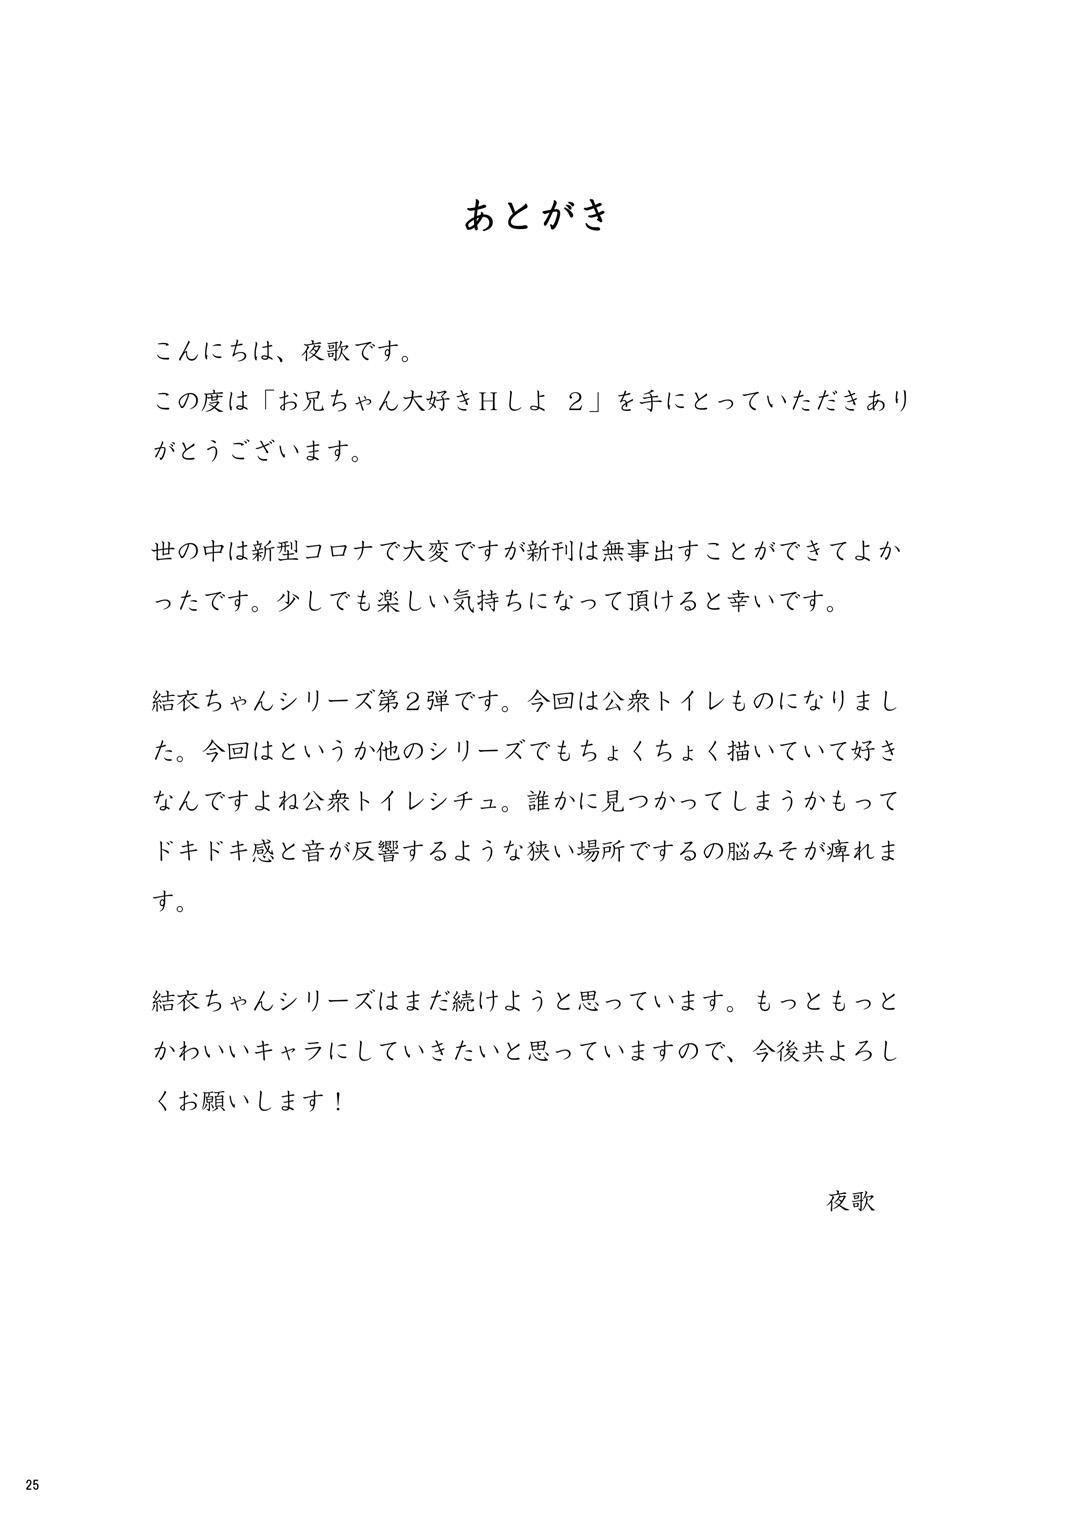 Onii-chan Daisuki H Shiyo 2 24